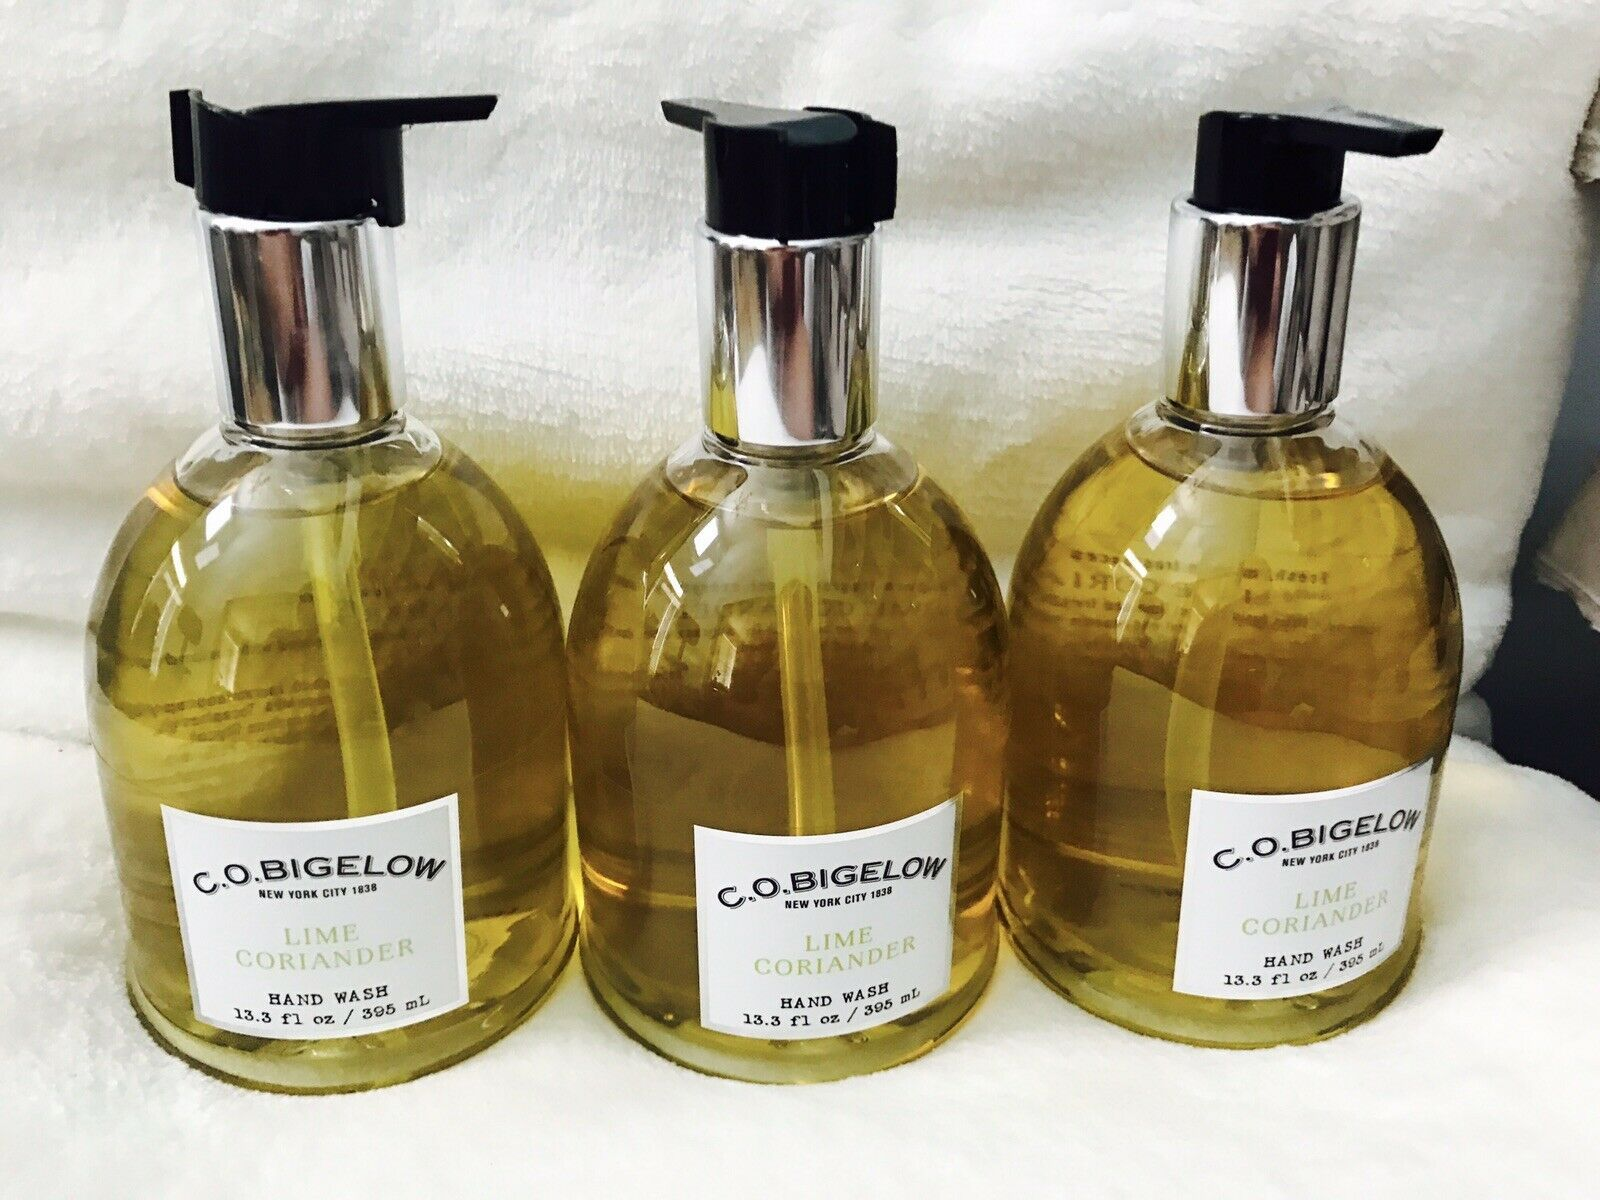 3 Bath & Body Works CO Bigelow Lime Coriander  Hand Soap Wash 13.3 oz